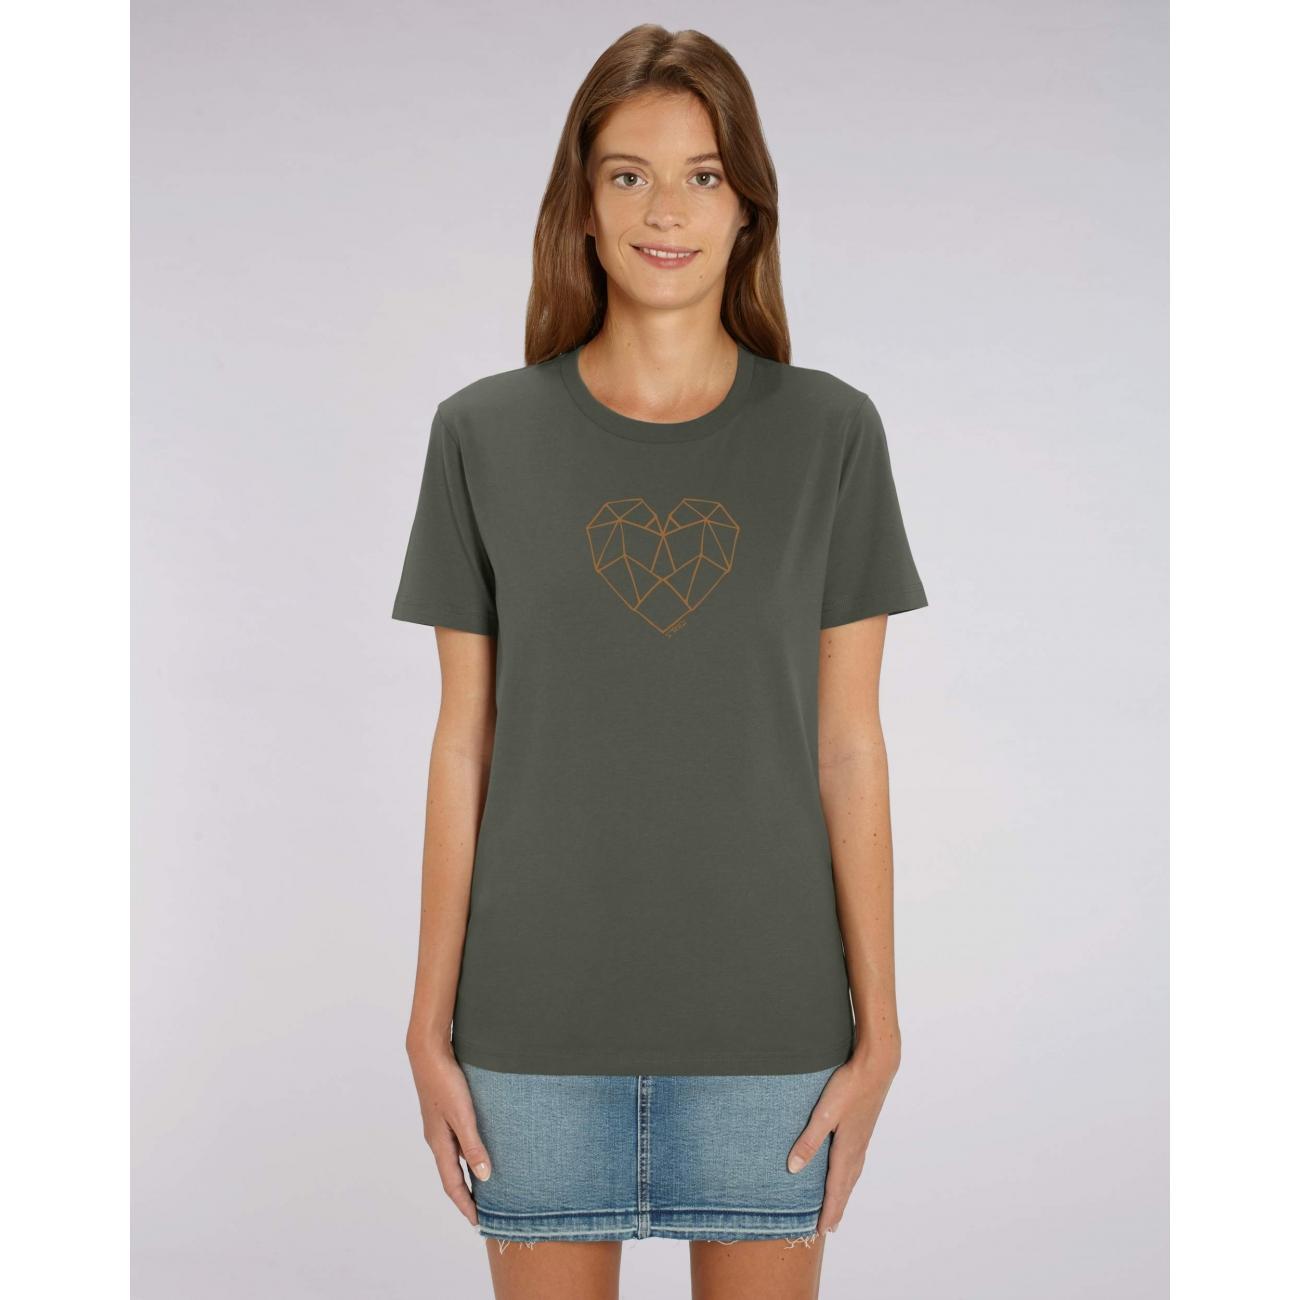 https://tee-shirt-bio.com/8139-thickbox_default/tee-shirt-couleur-kaki-coton-bio-impression-coeur-origami-or-mat-creator.jpg